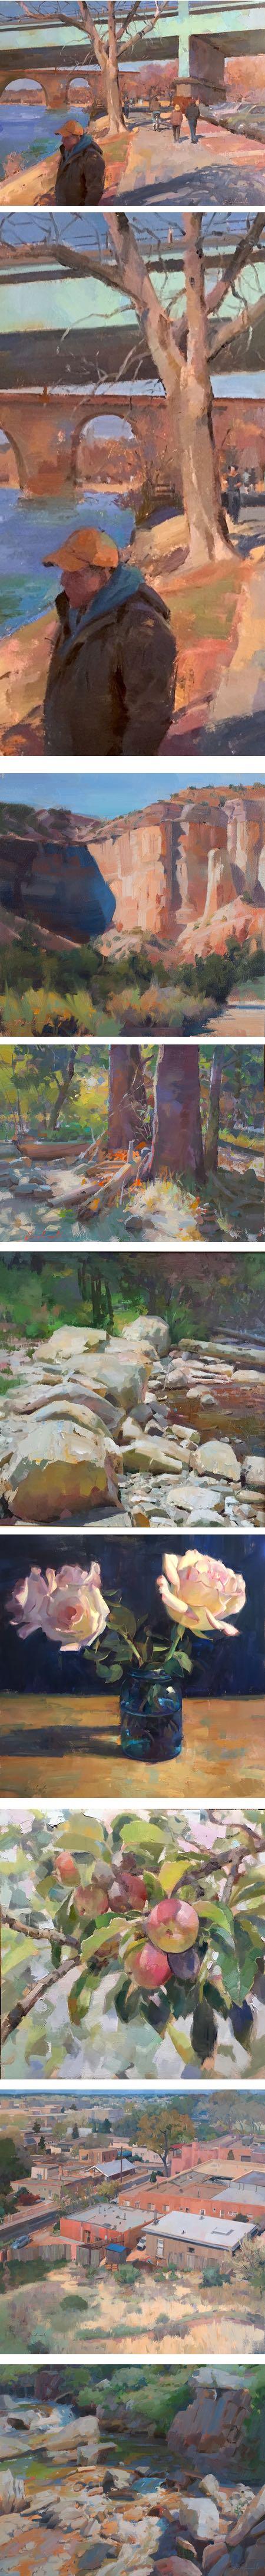 Louis Escobedo, landscapem still life, figures